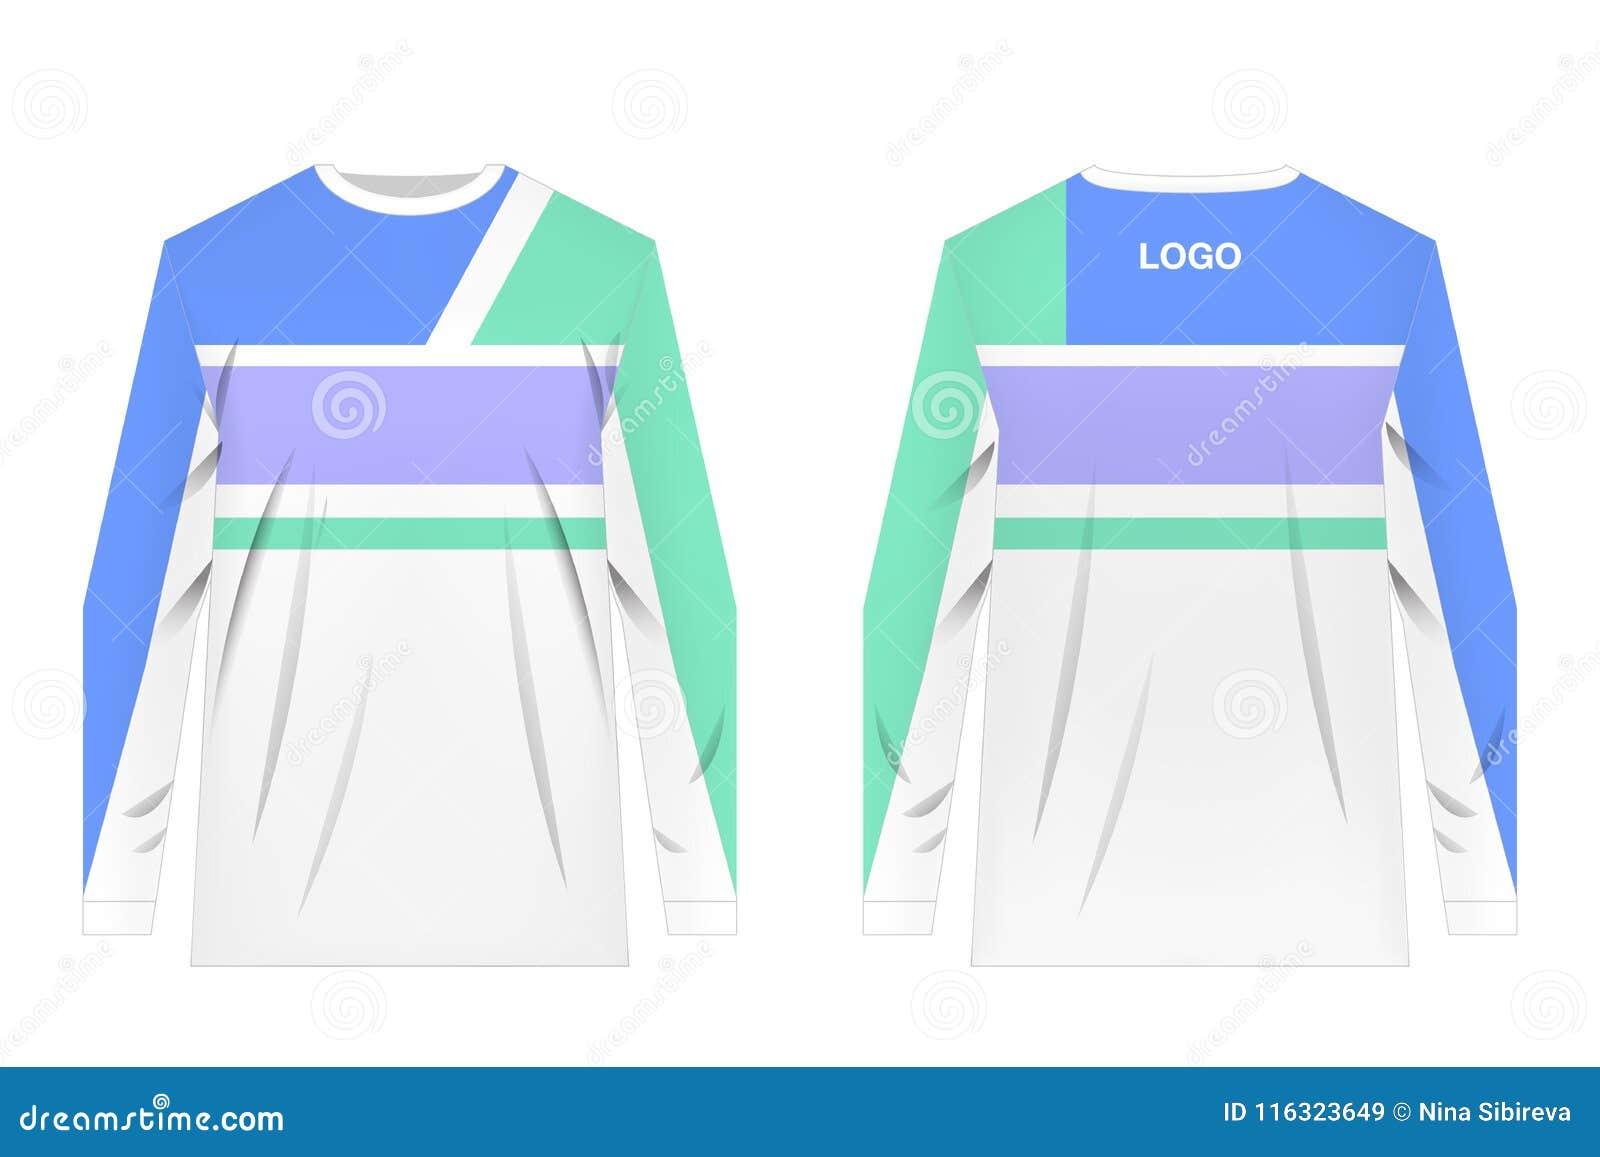 Dye Sublimation T Shirt Template   Oregon Guide Book